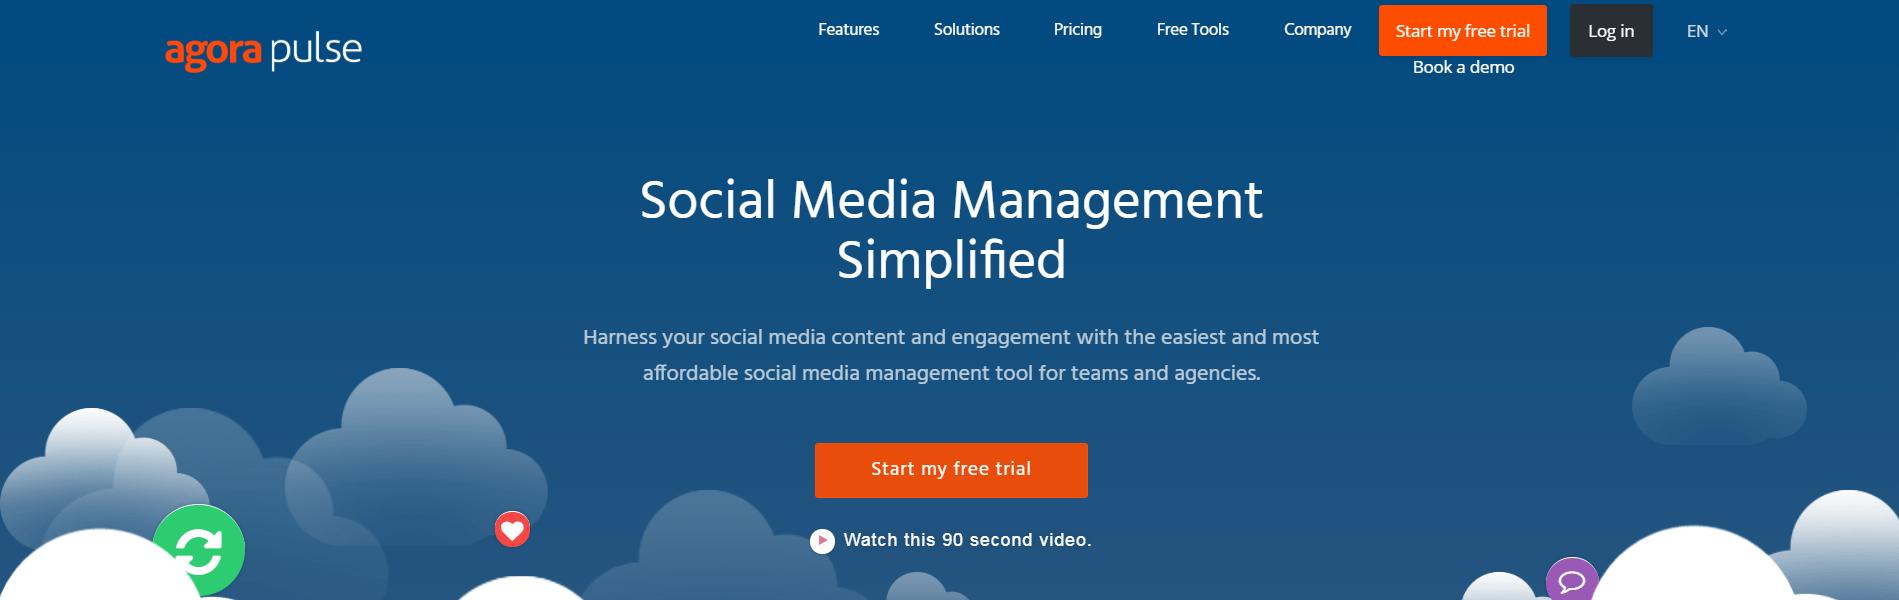 The Agorapulse website.